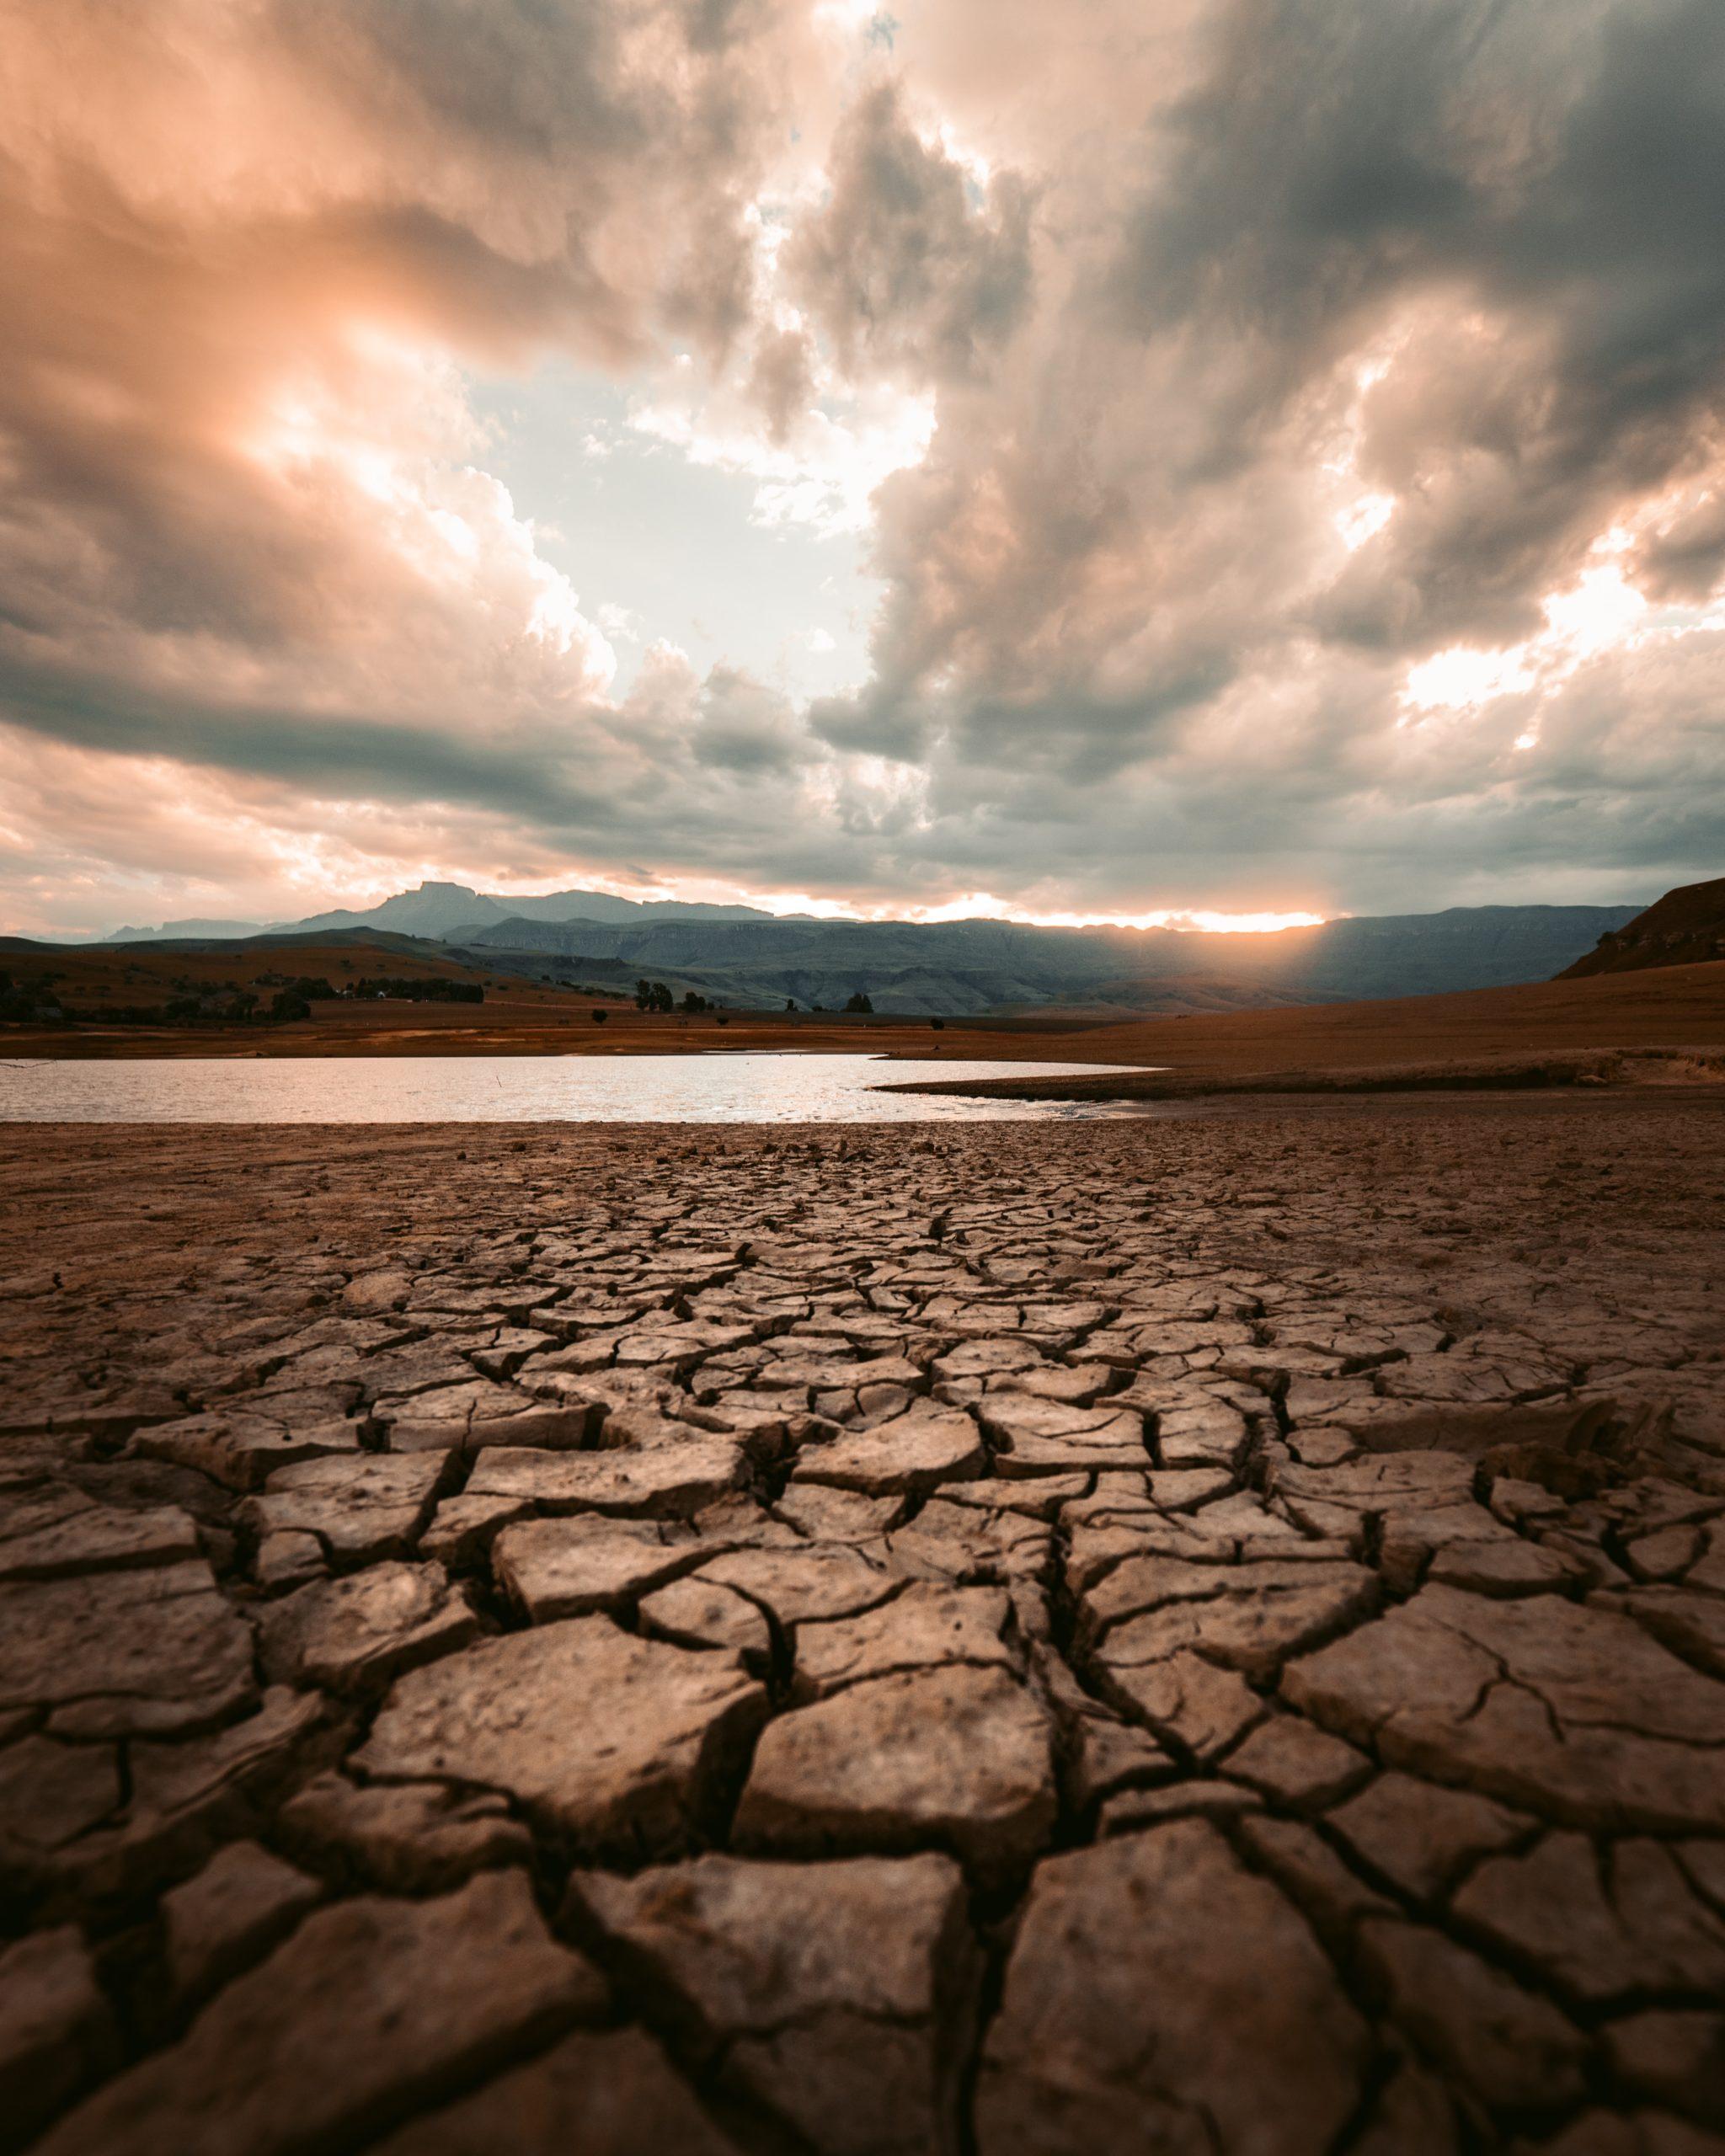 God faith migration climate crisis